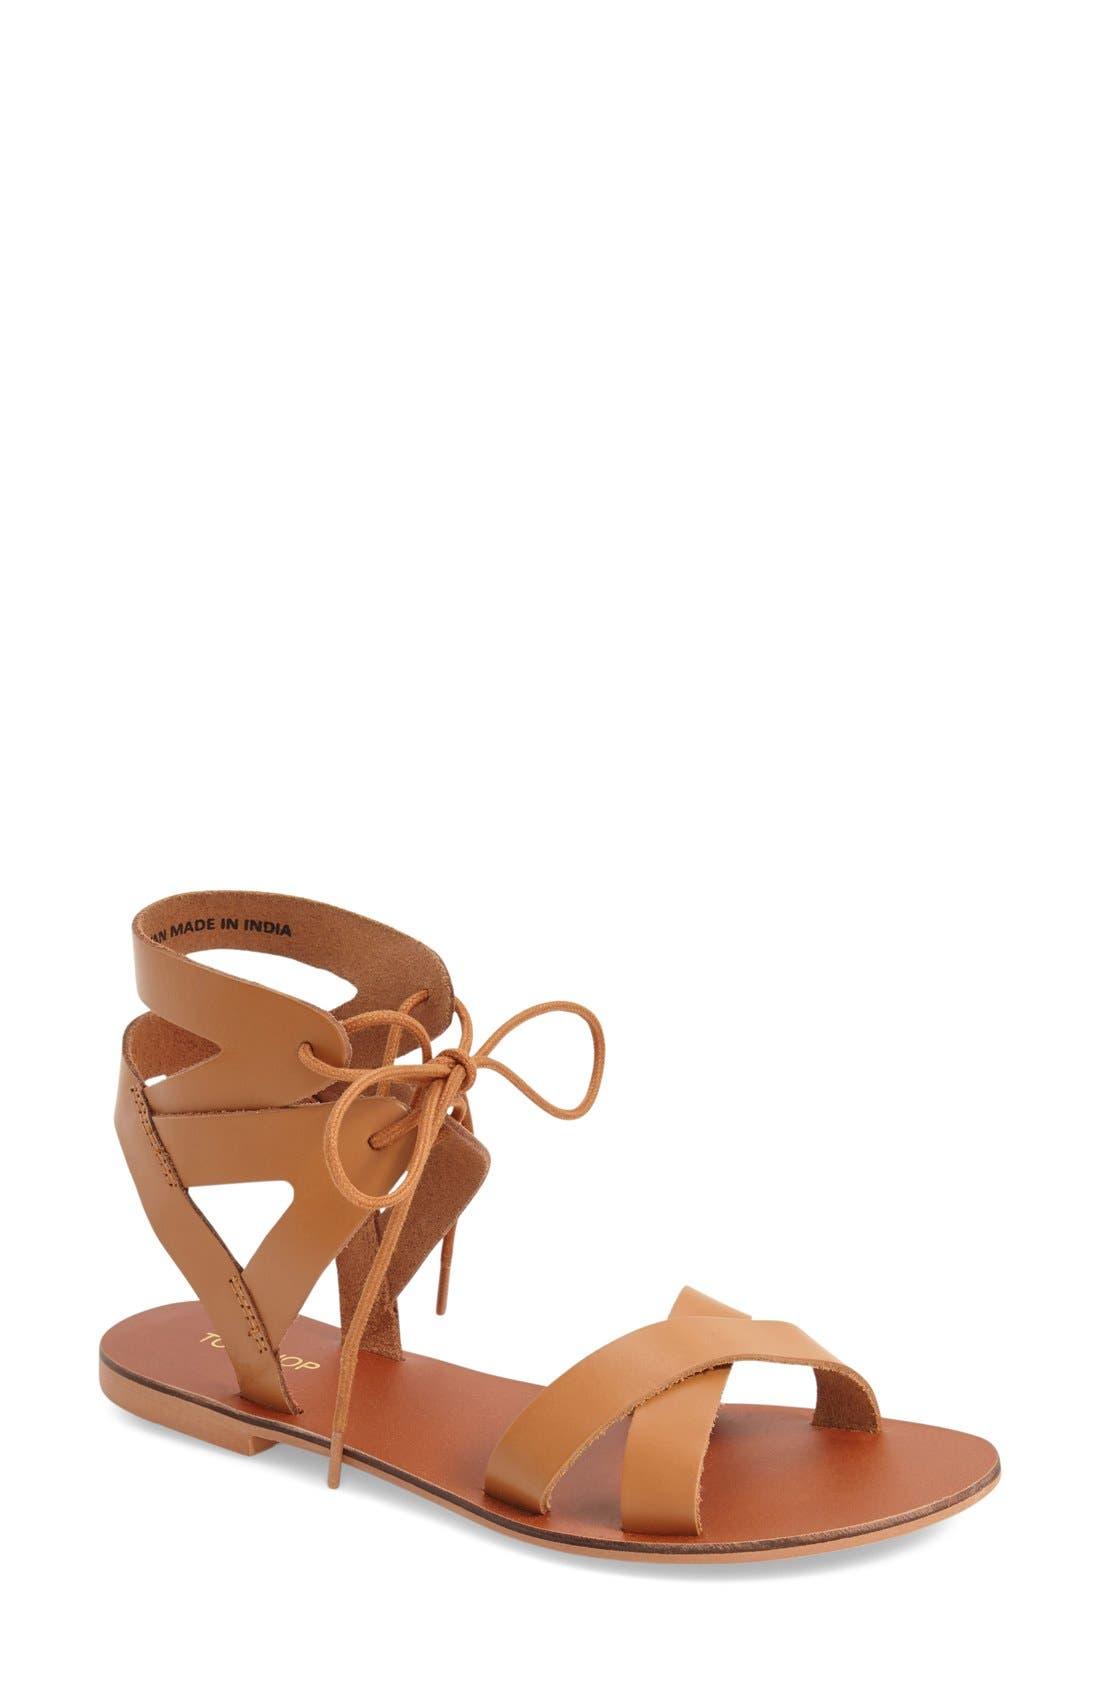 'Herb' Lace-Up Flat Sandal,                         Main,                         color, 210